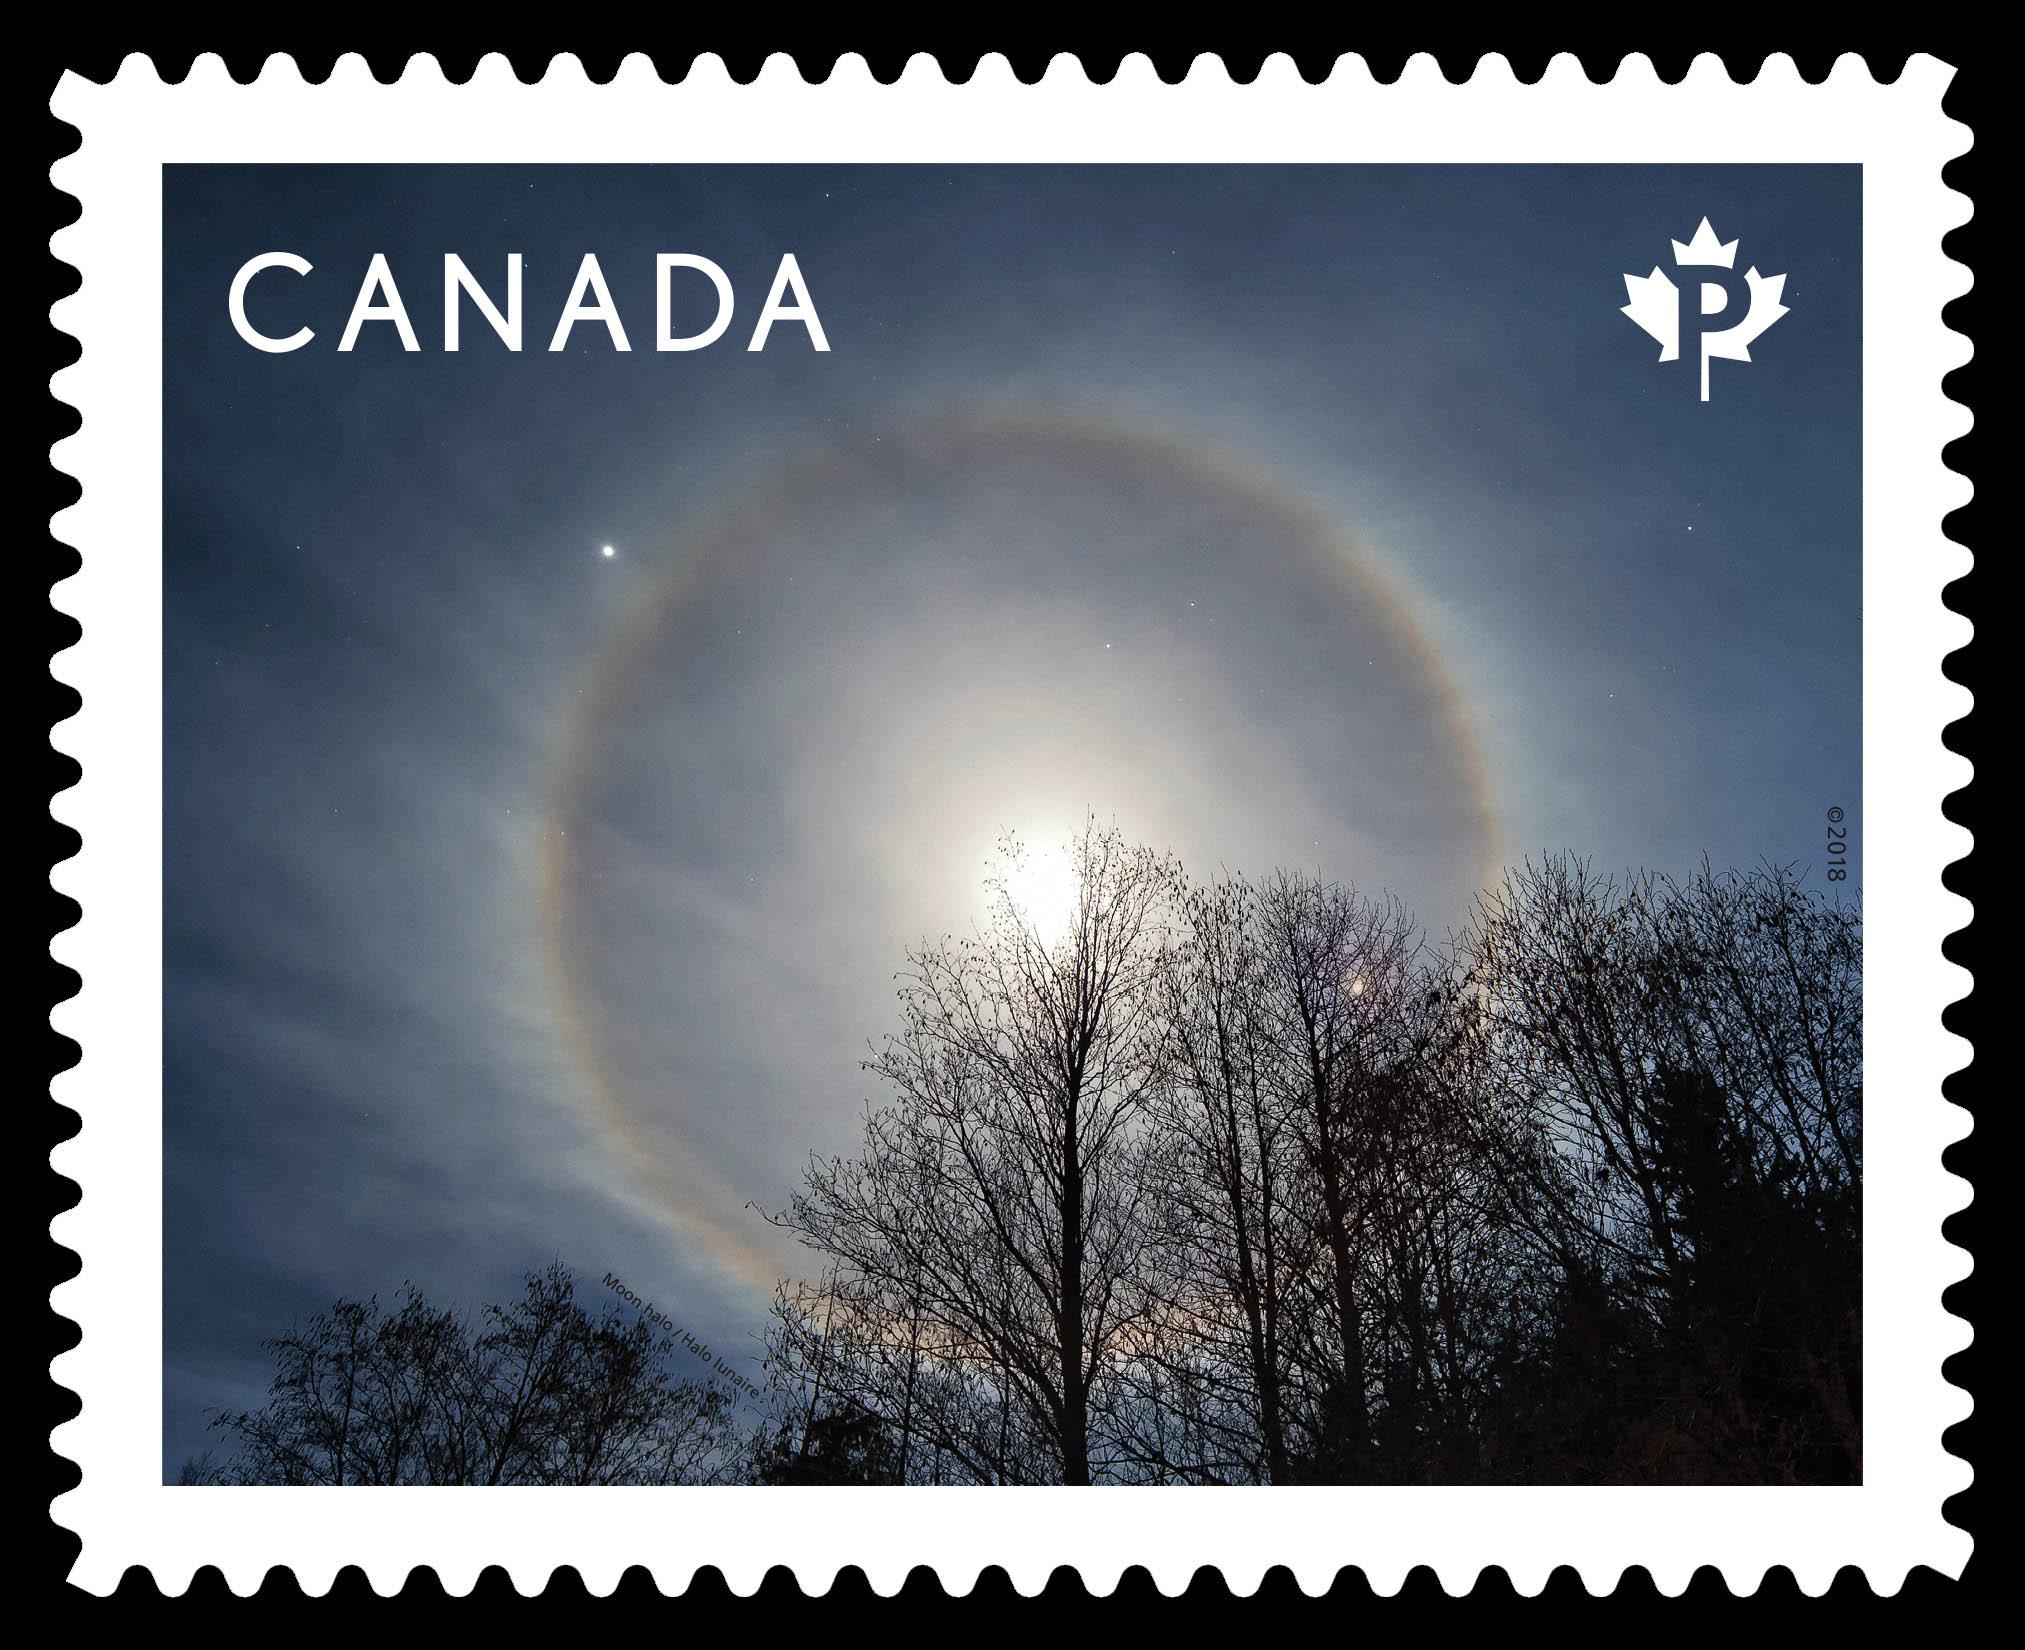 Moon Halo Canada Postage Stamp | Weather Wonders